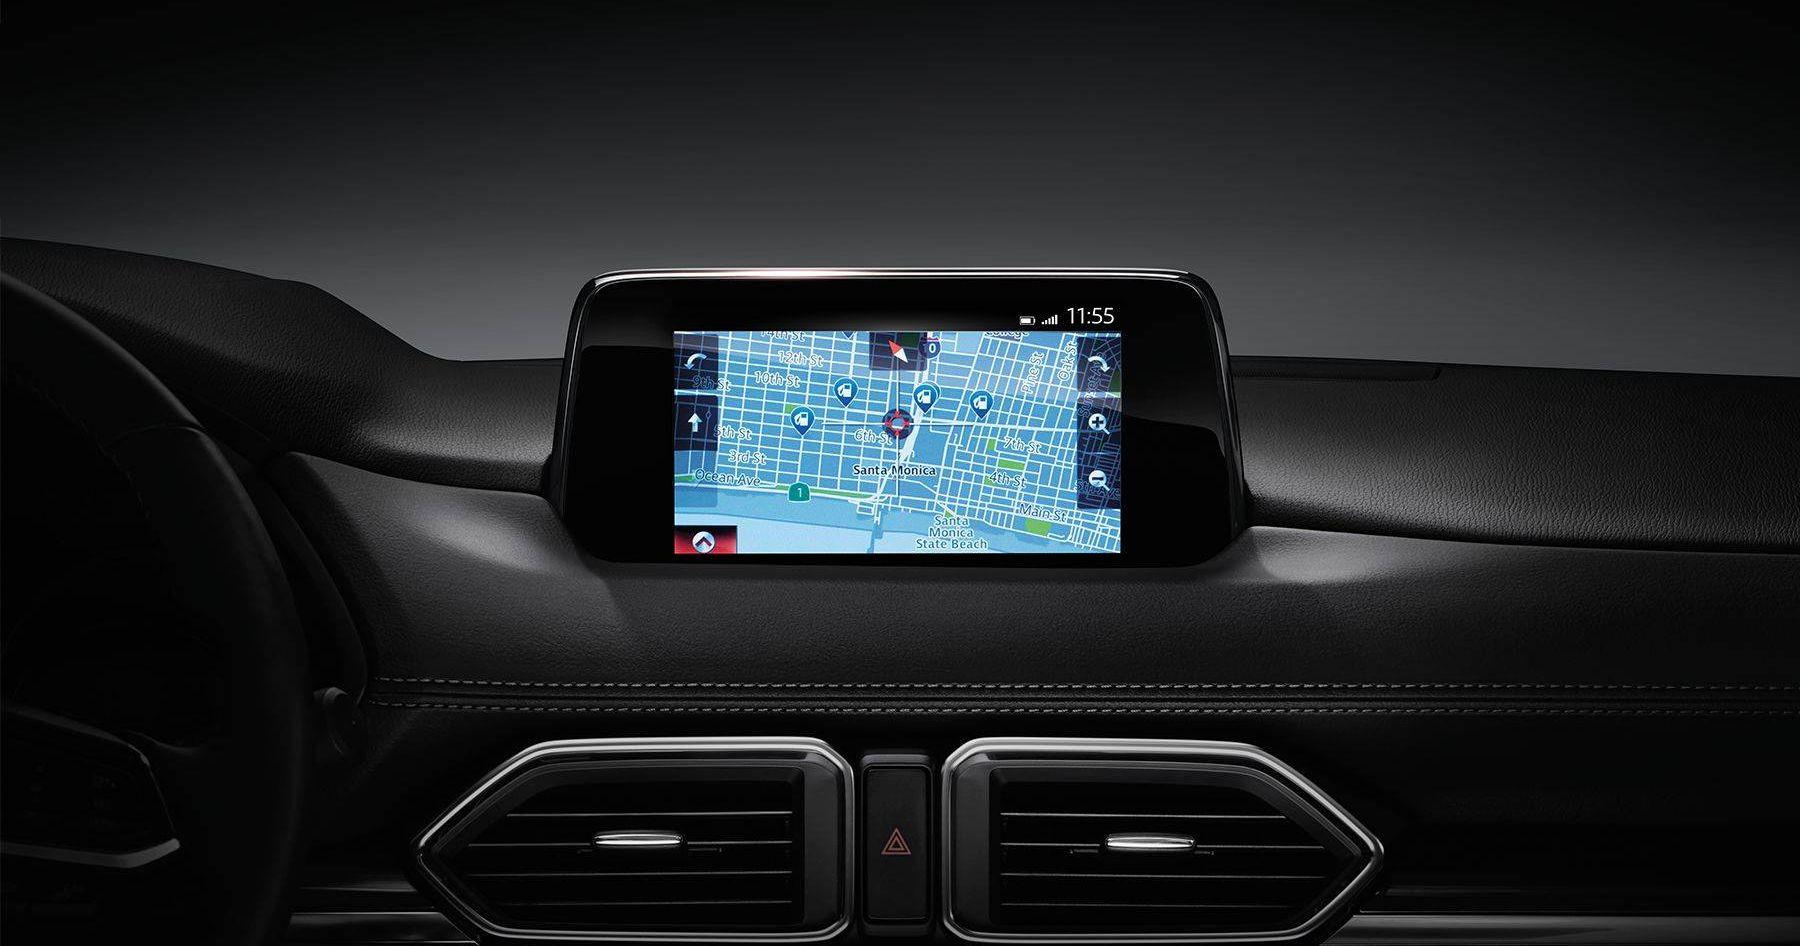 Mazda CX-5 Navigation System